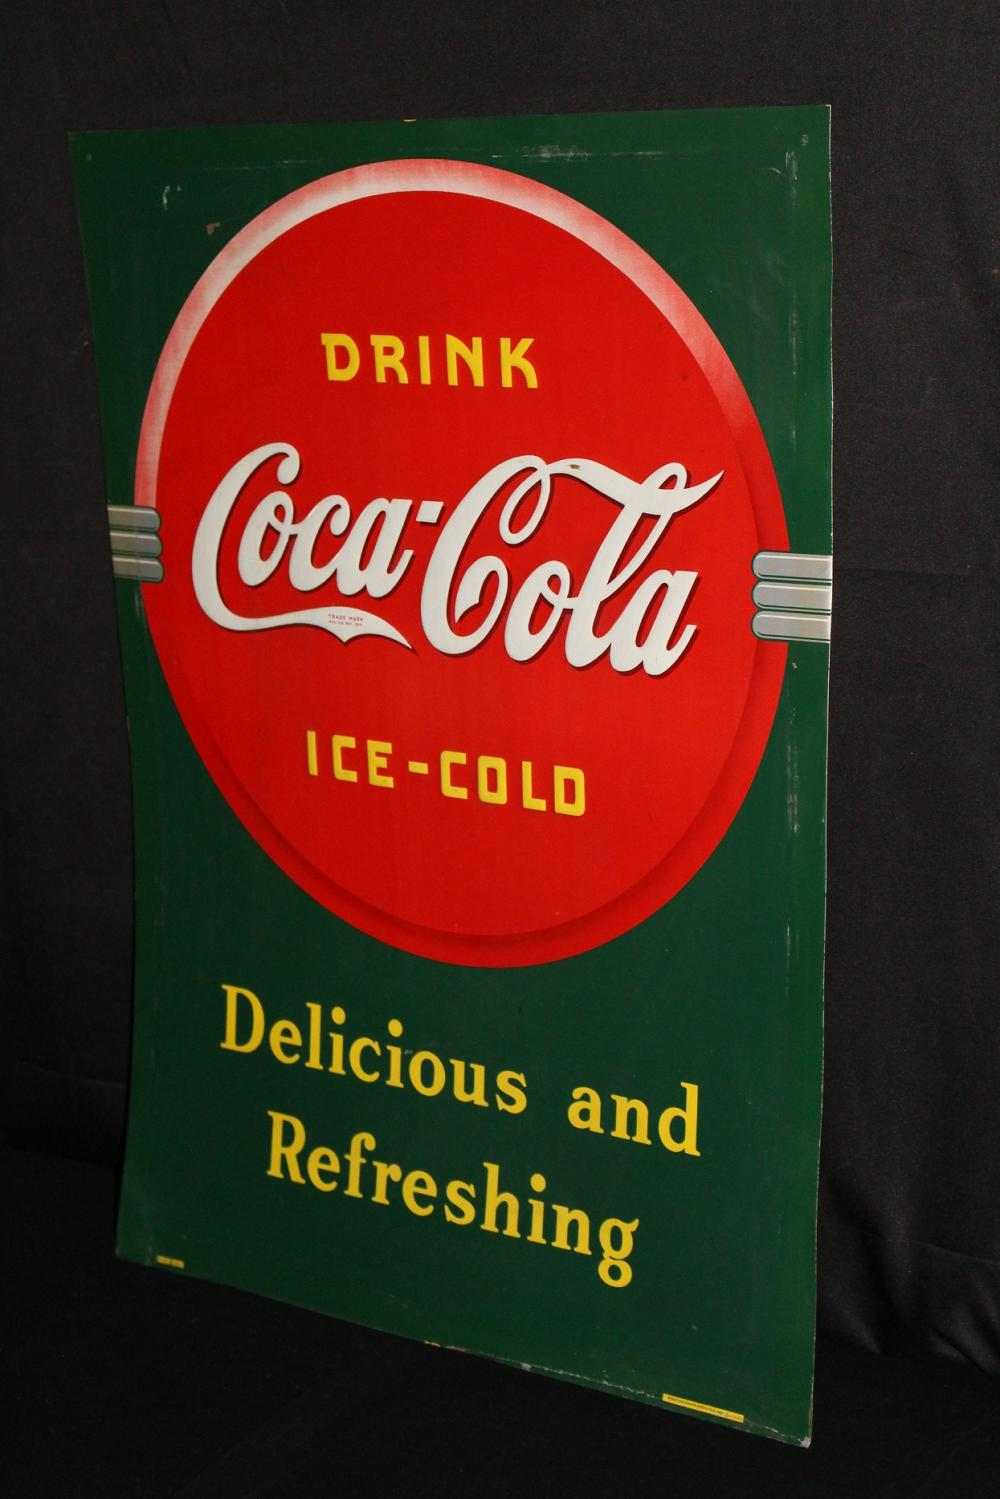 DRINK ICE COLD COCA COLA TIN SODA POP SIGN